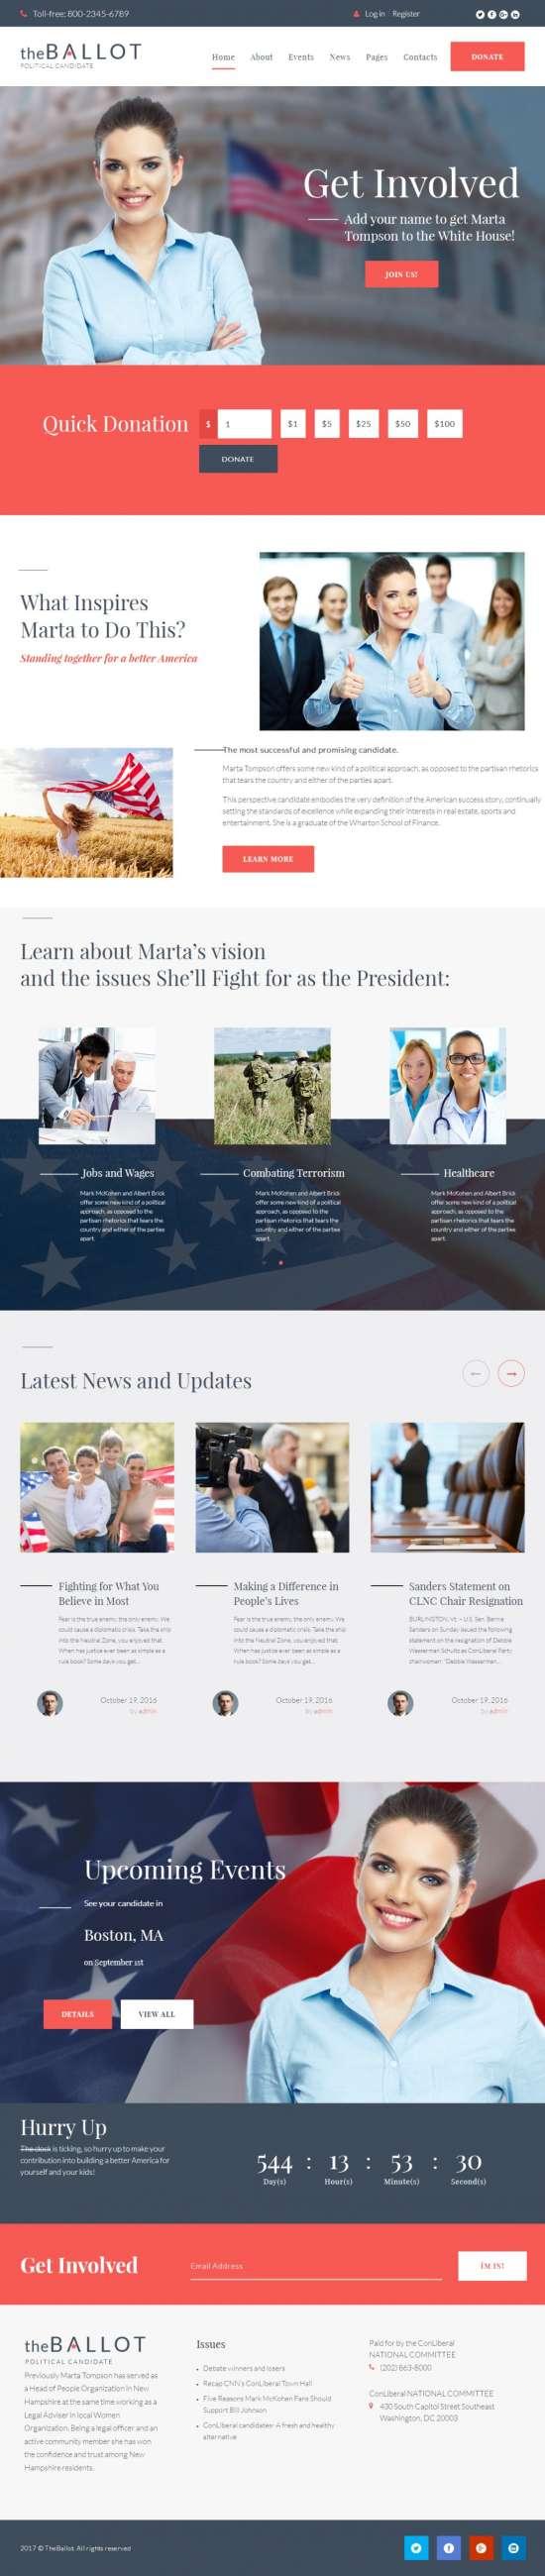 the ballot–political candidate wordpress theme 550x2600 - The Ballot WordPress Theme